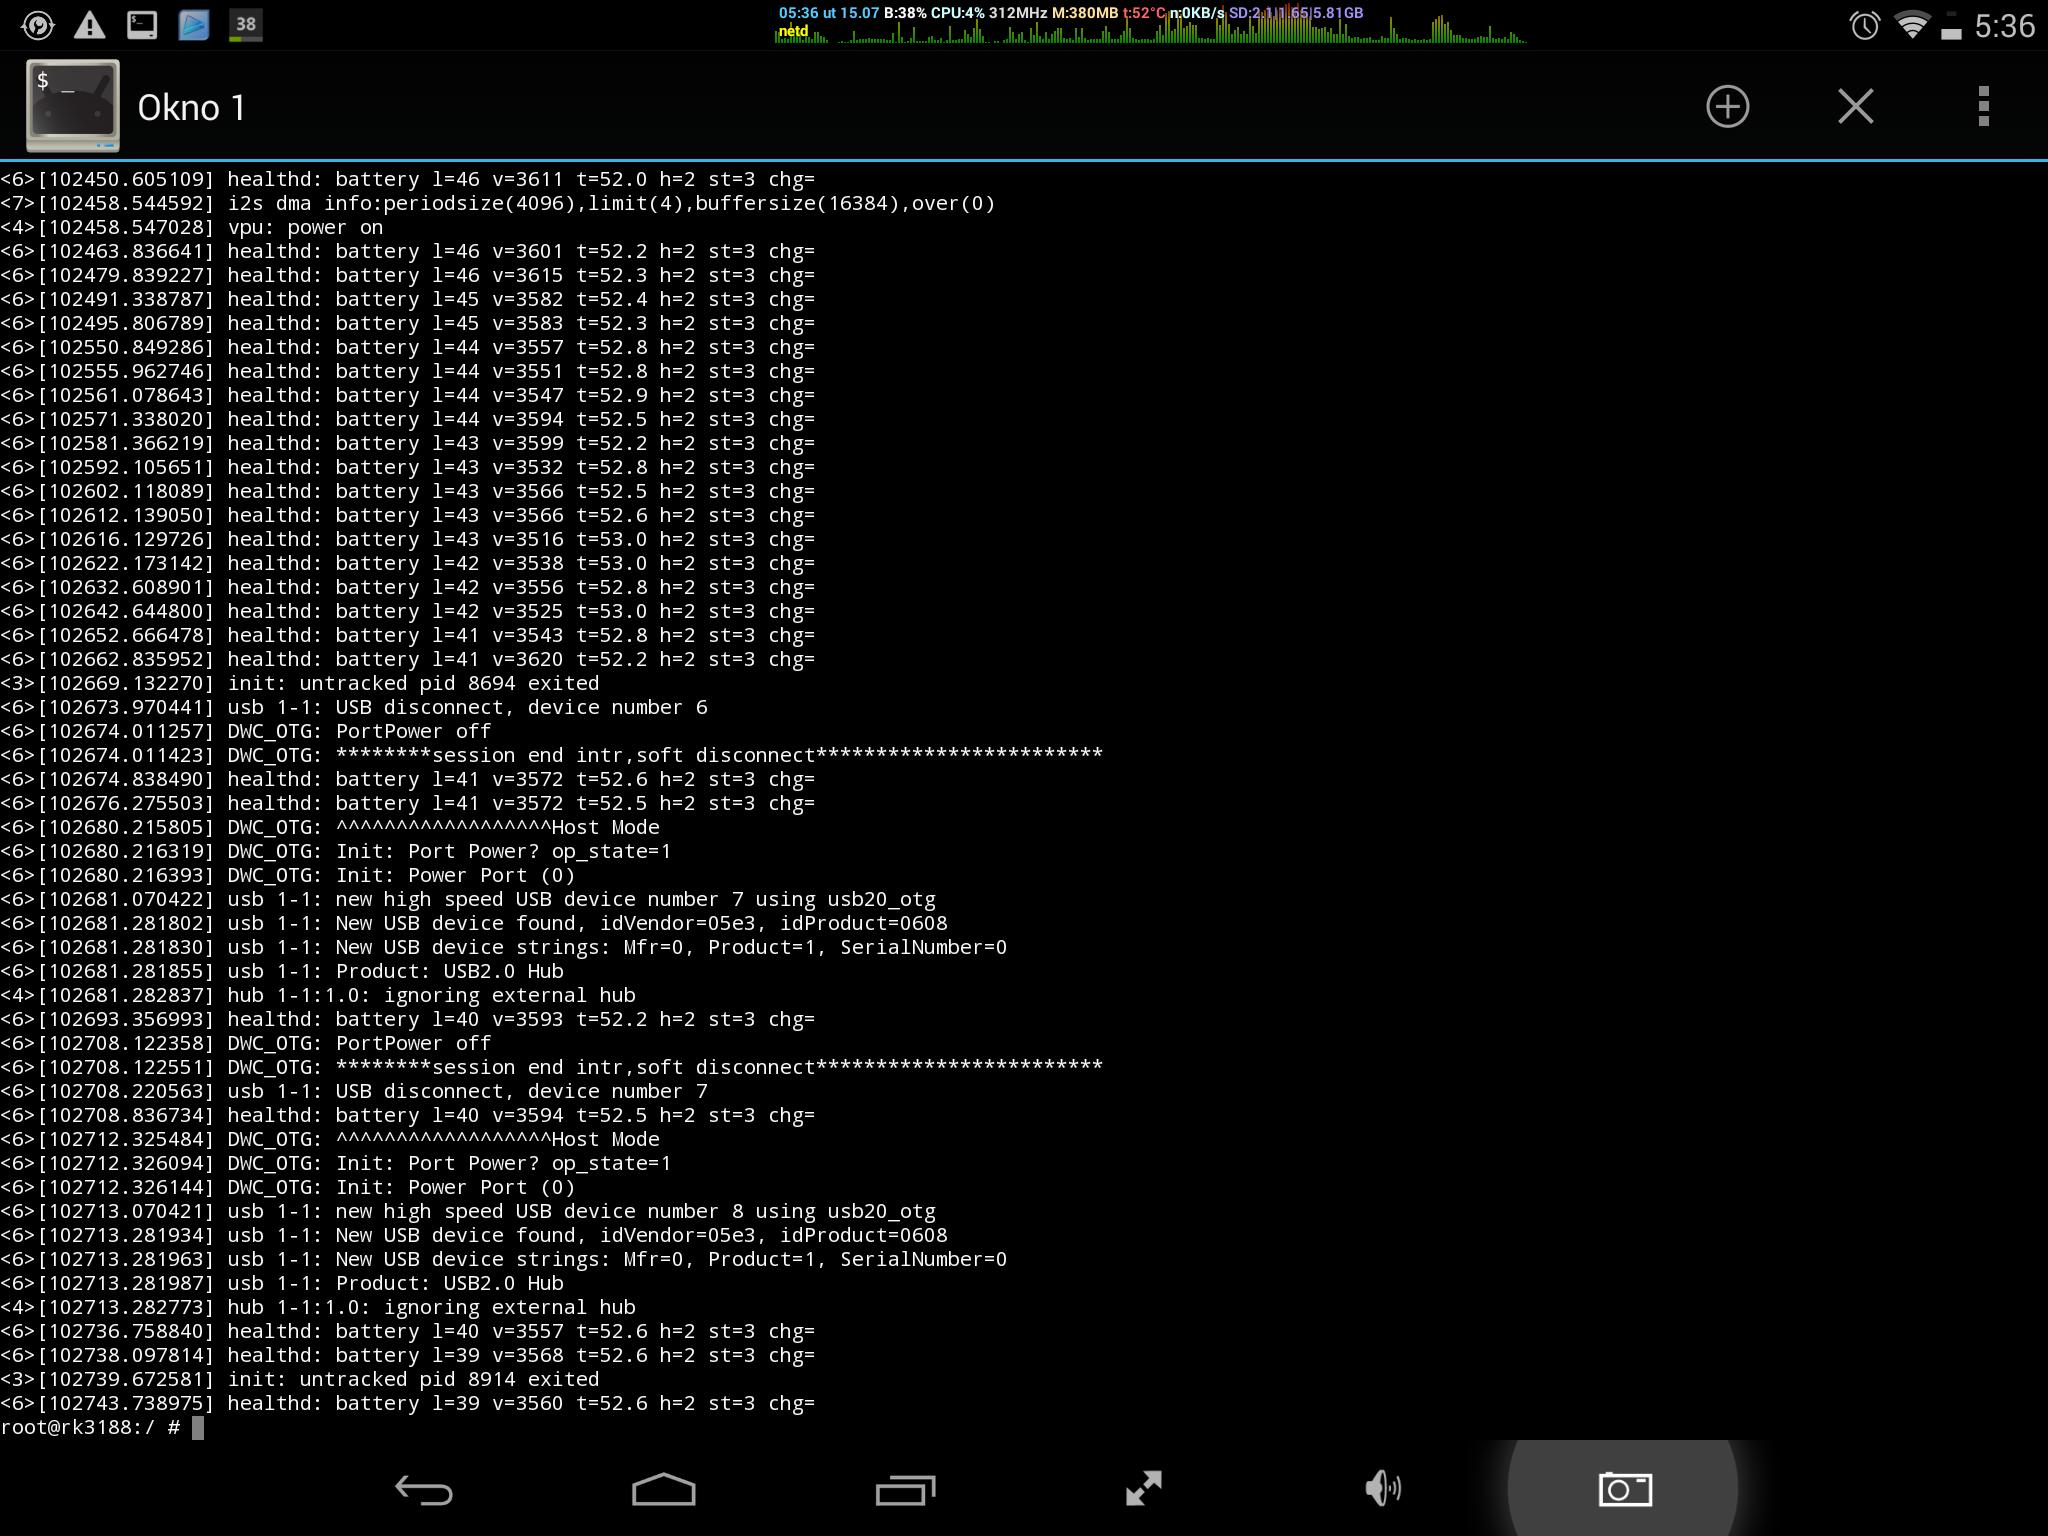 Screenshot_2014-07-15-05-36-41.png